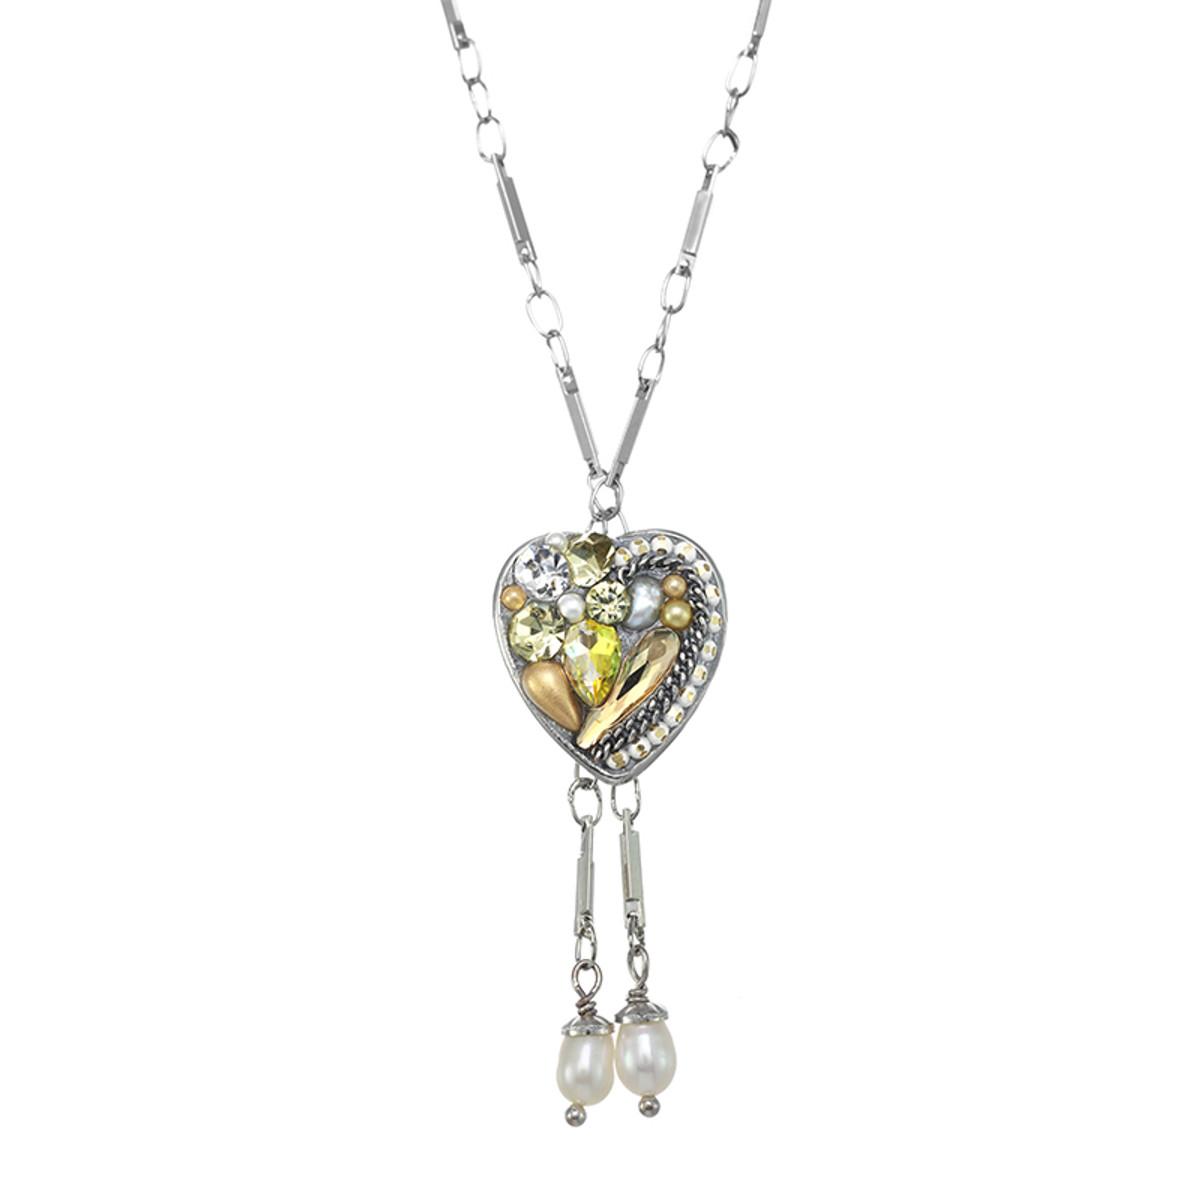 Michal Golan Moonlight Heart Dangling Necklace